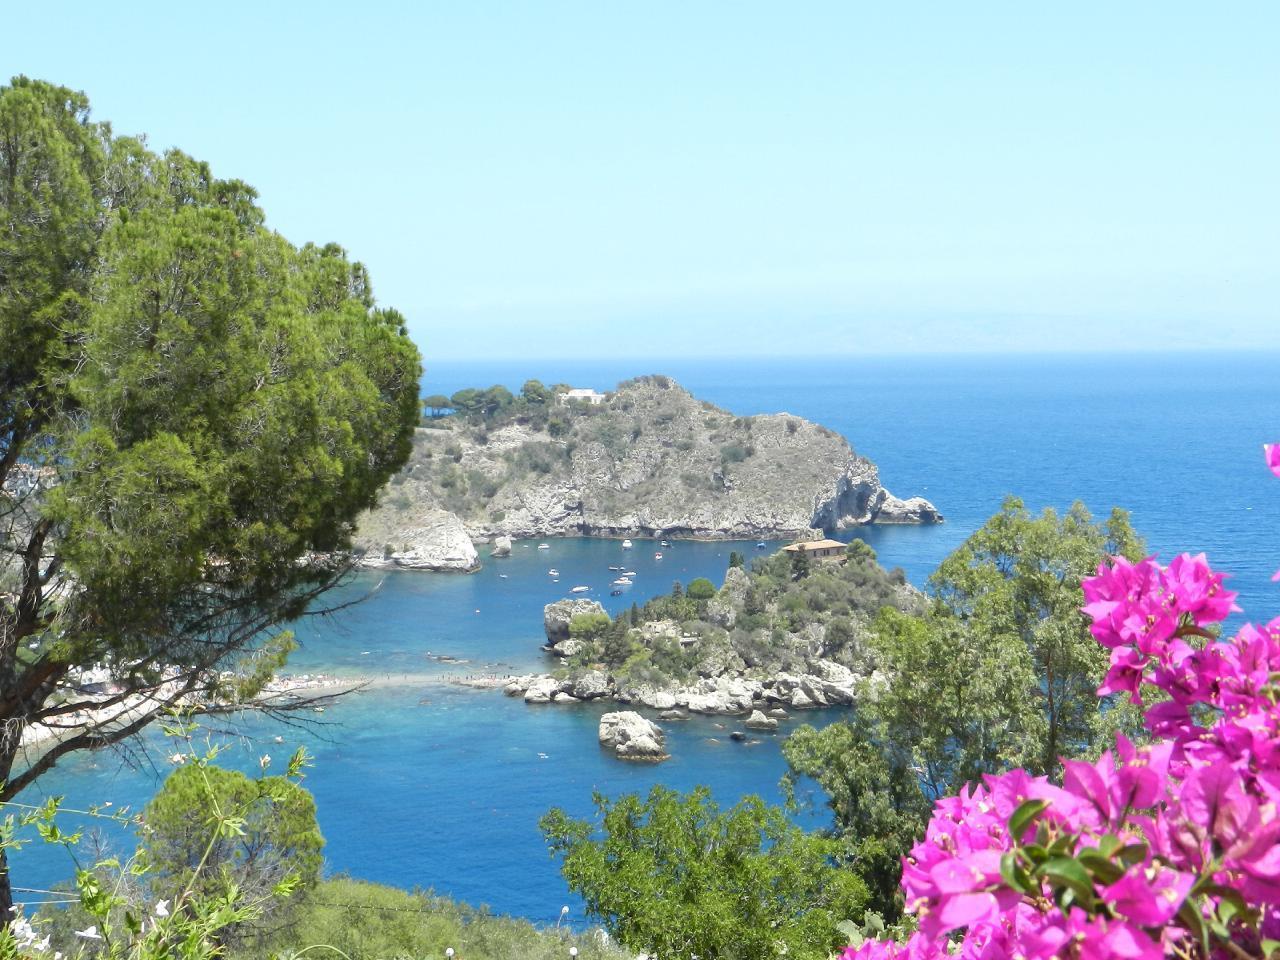 Appartement de vacances Fewo mit Balkon im Panorama-Dorf bei Taormina (737398), Forza d'Agro', Messina, Sicile, Italie, image 14